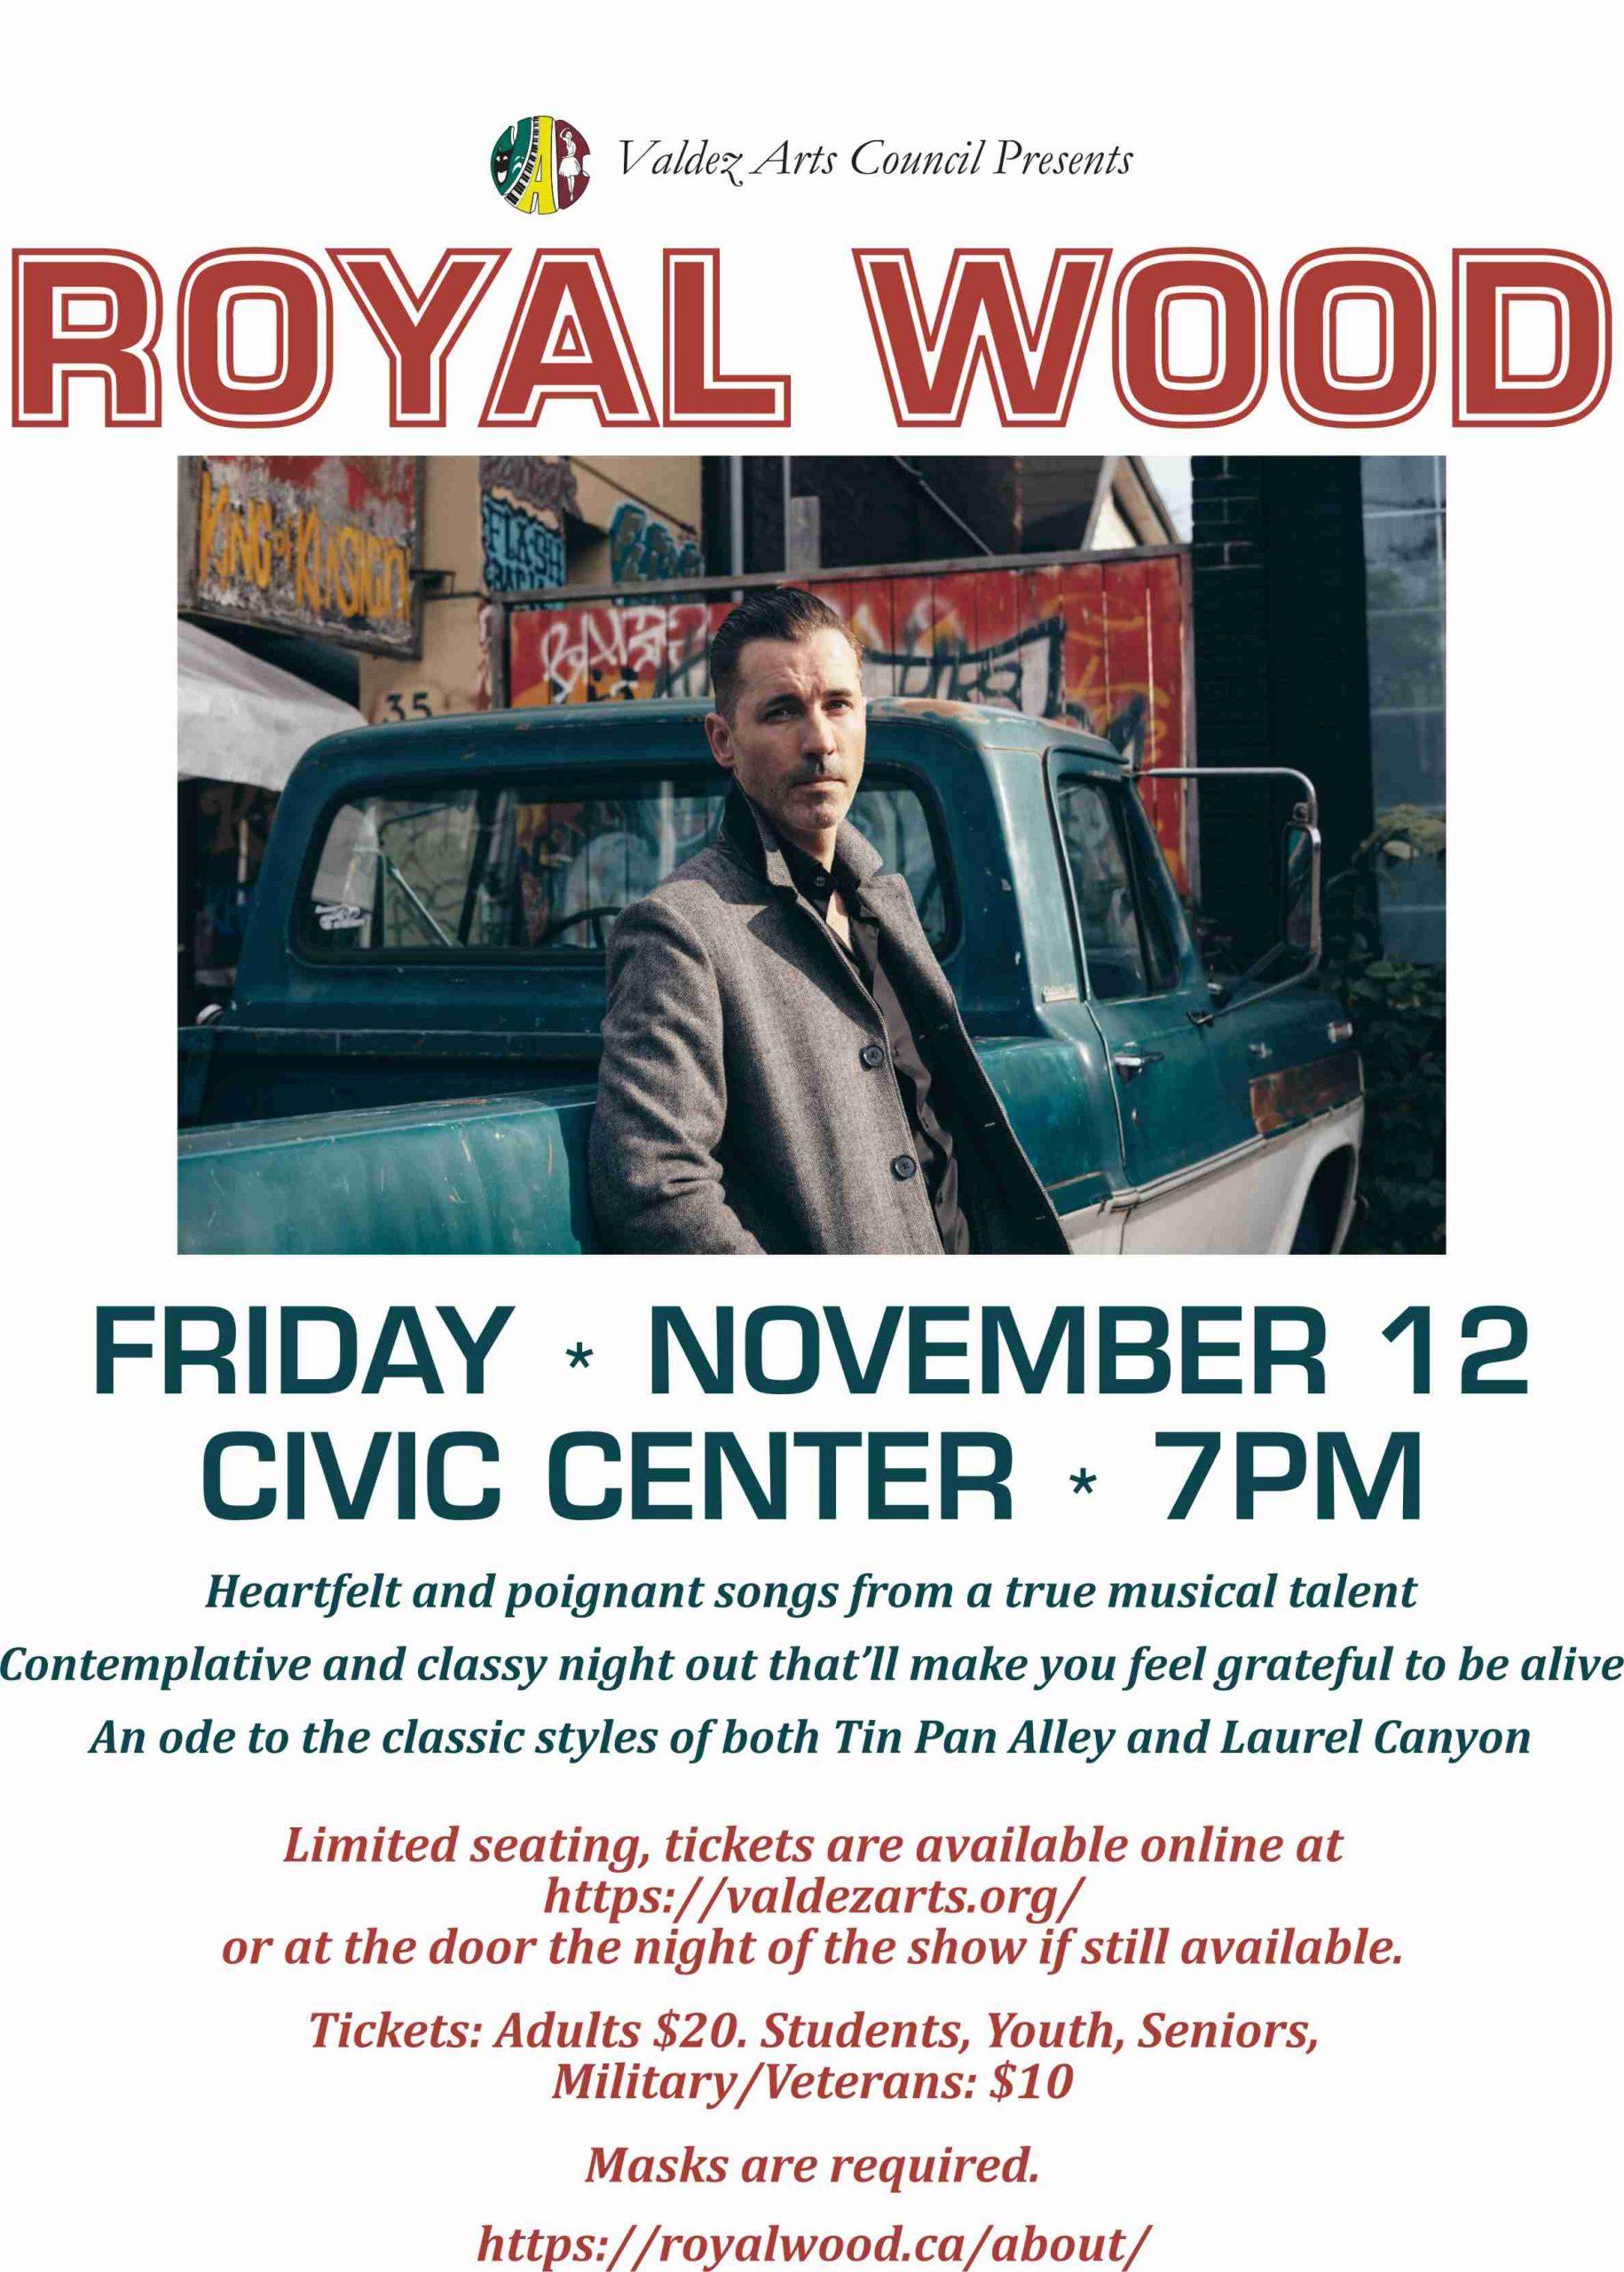 Royal Wood flyer